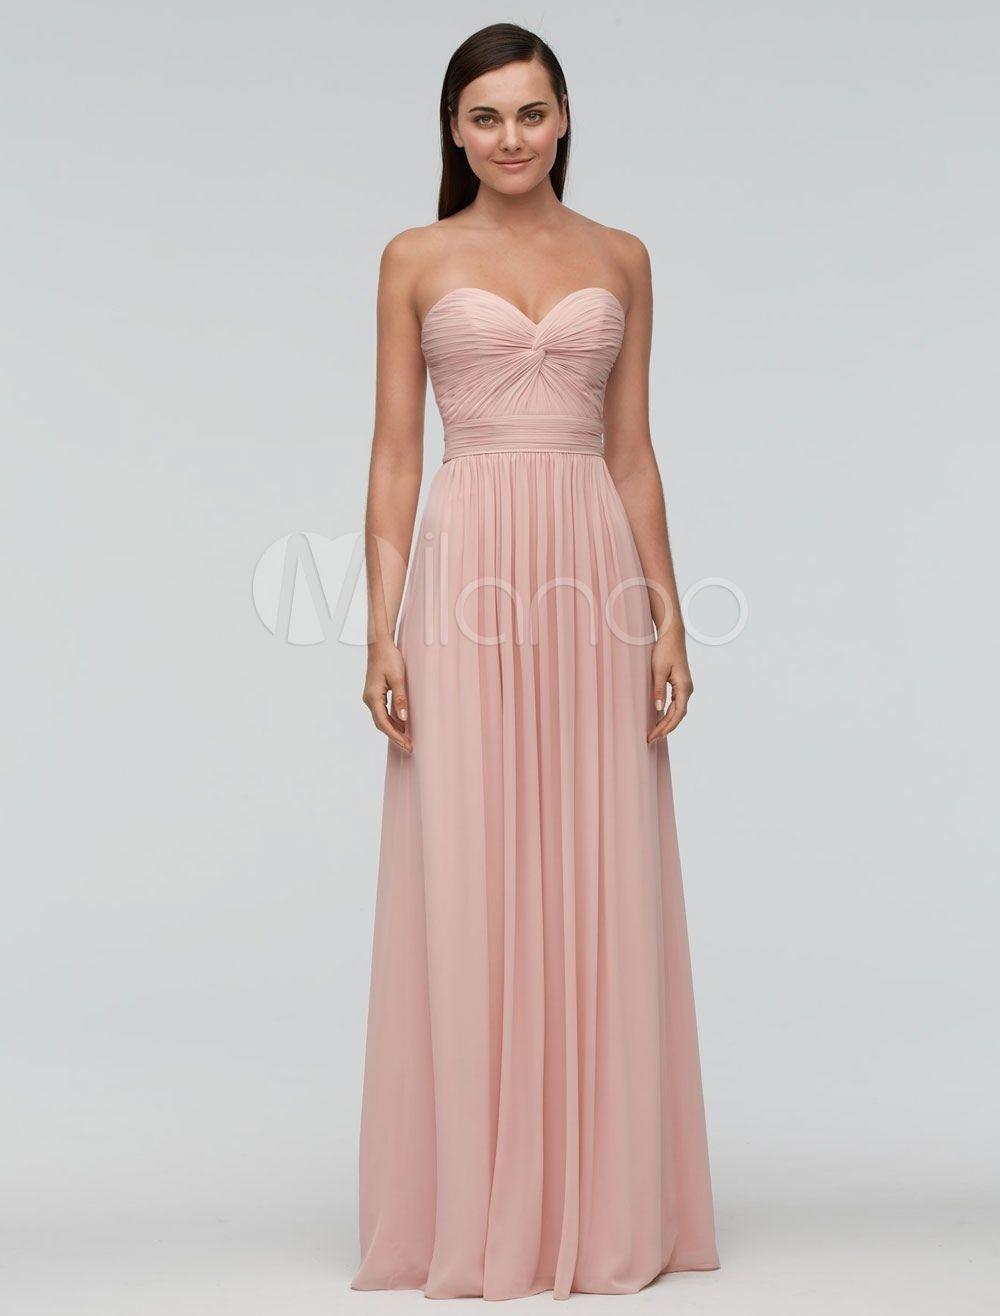 10 Großartig Rosa Kleid A Linie Spezialgebiet10 Luxurius Rosa Kleid A Linie Design